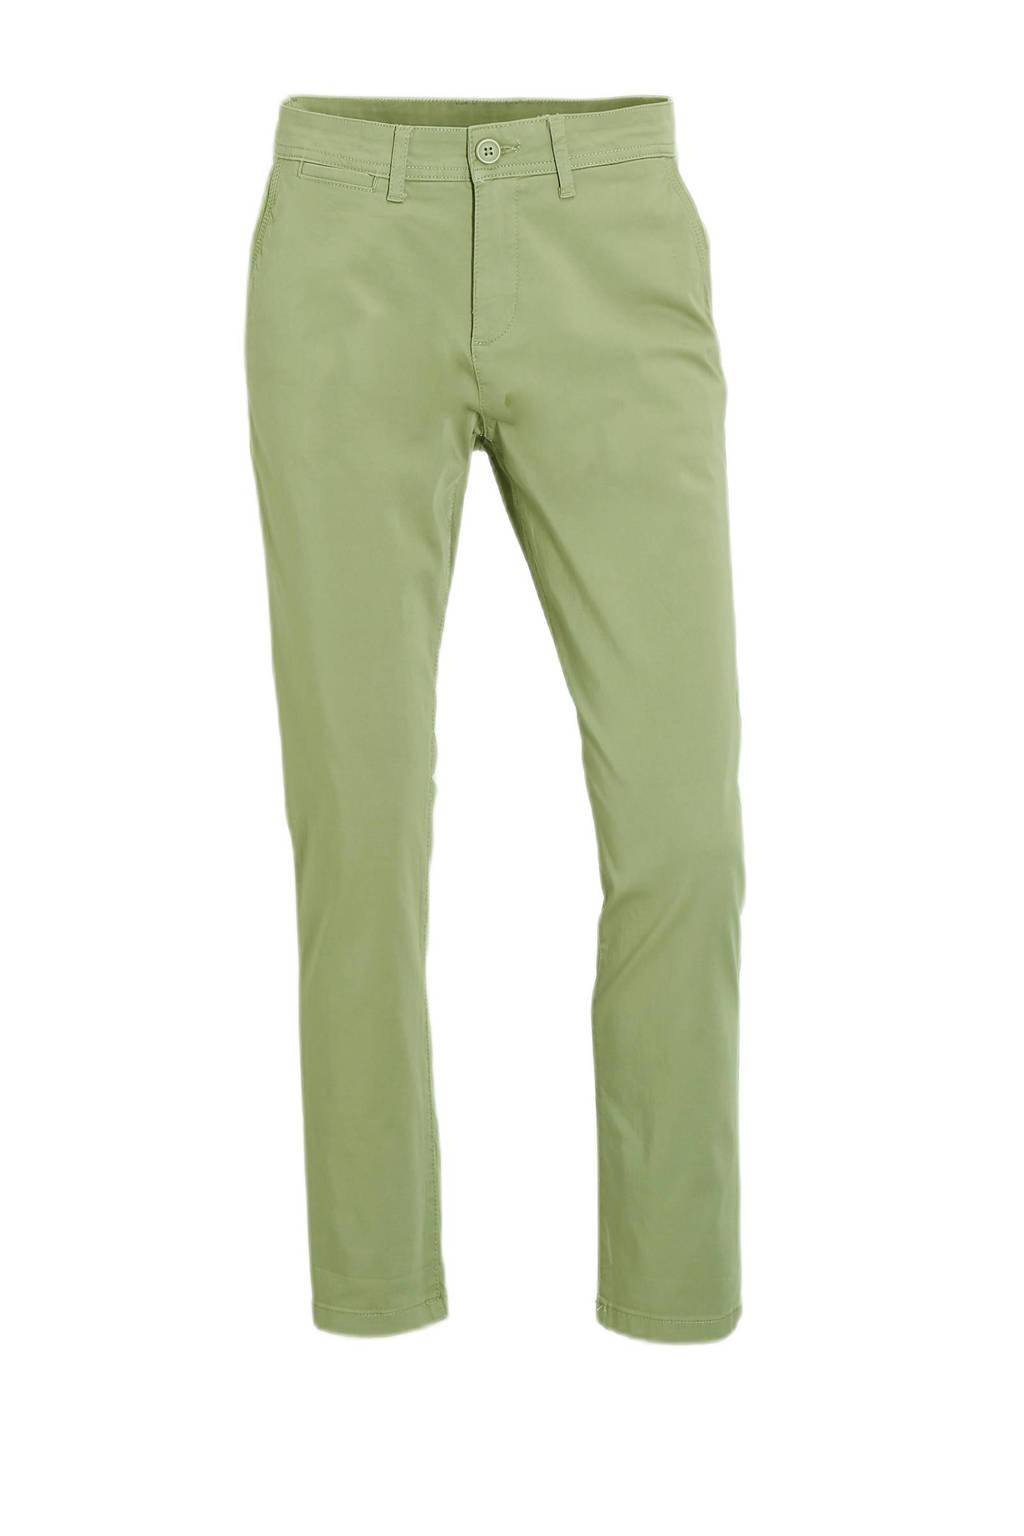 C&A Yessica regular fit broek groen, Groen